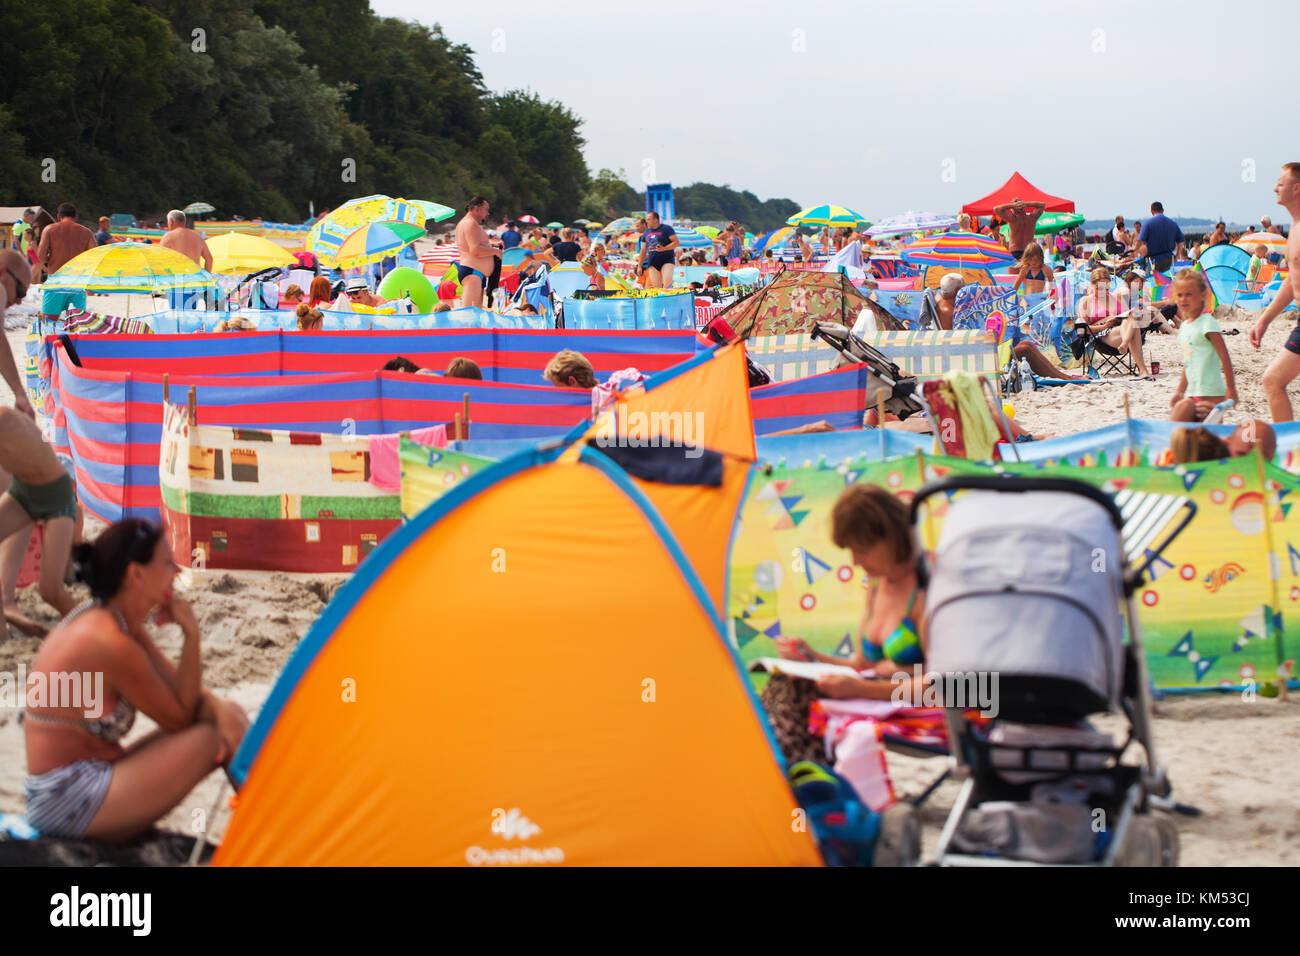 Polish sea, beach - crowds on the beach. chaos, color, screens - Stock Image